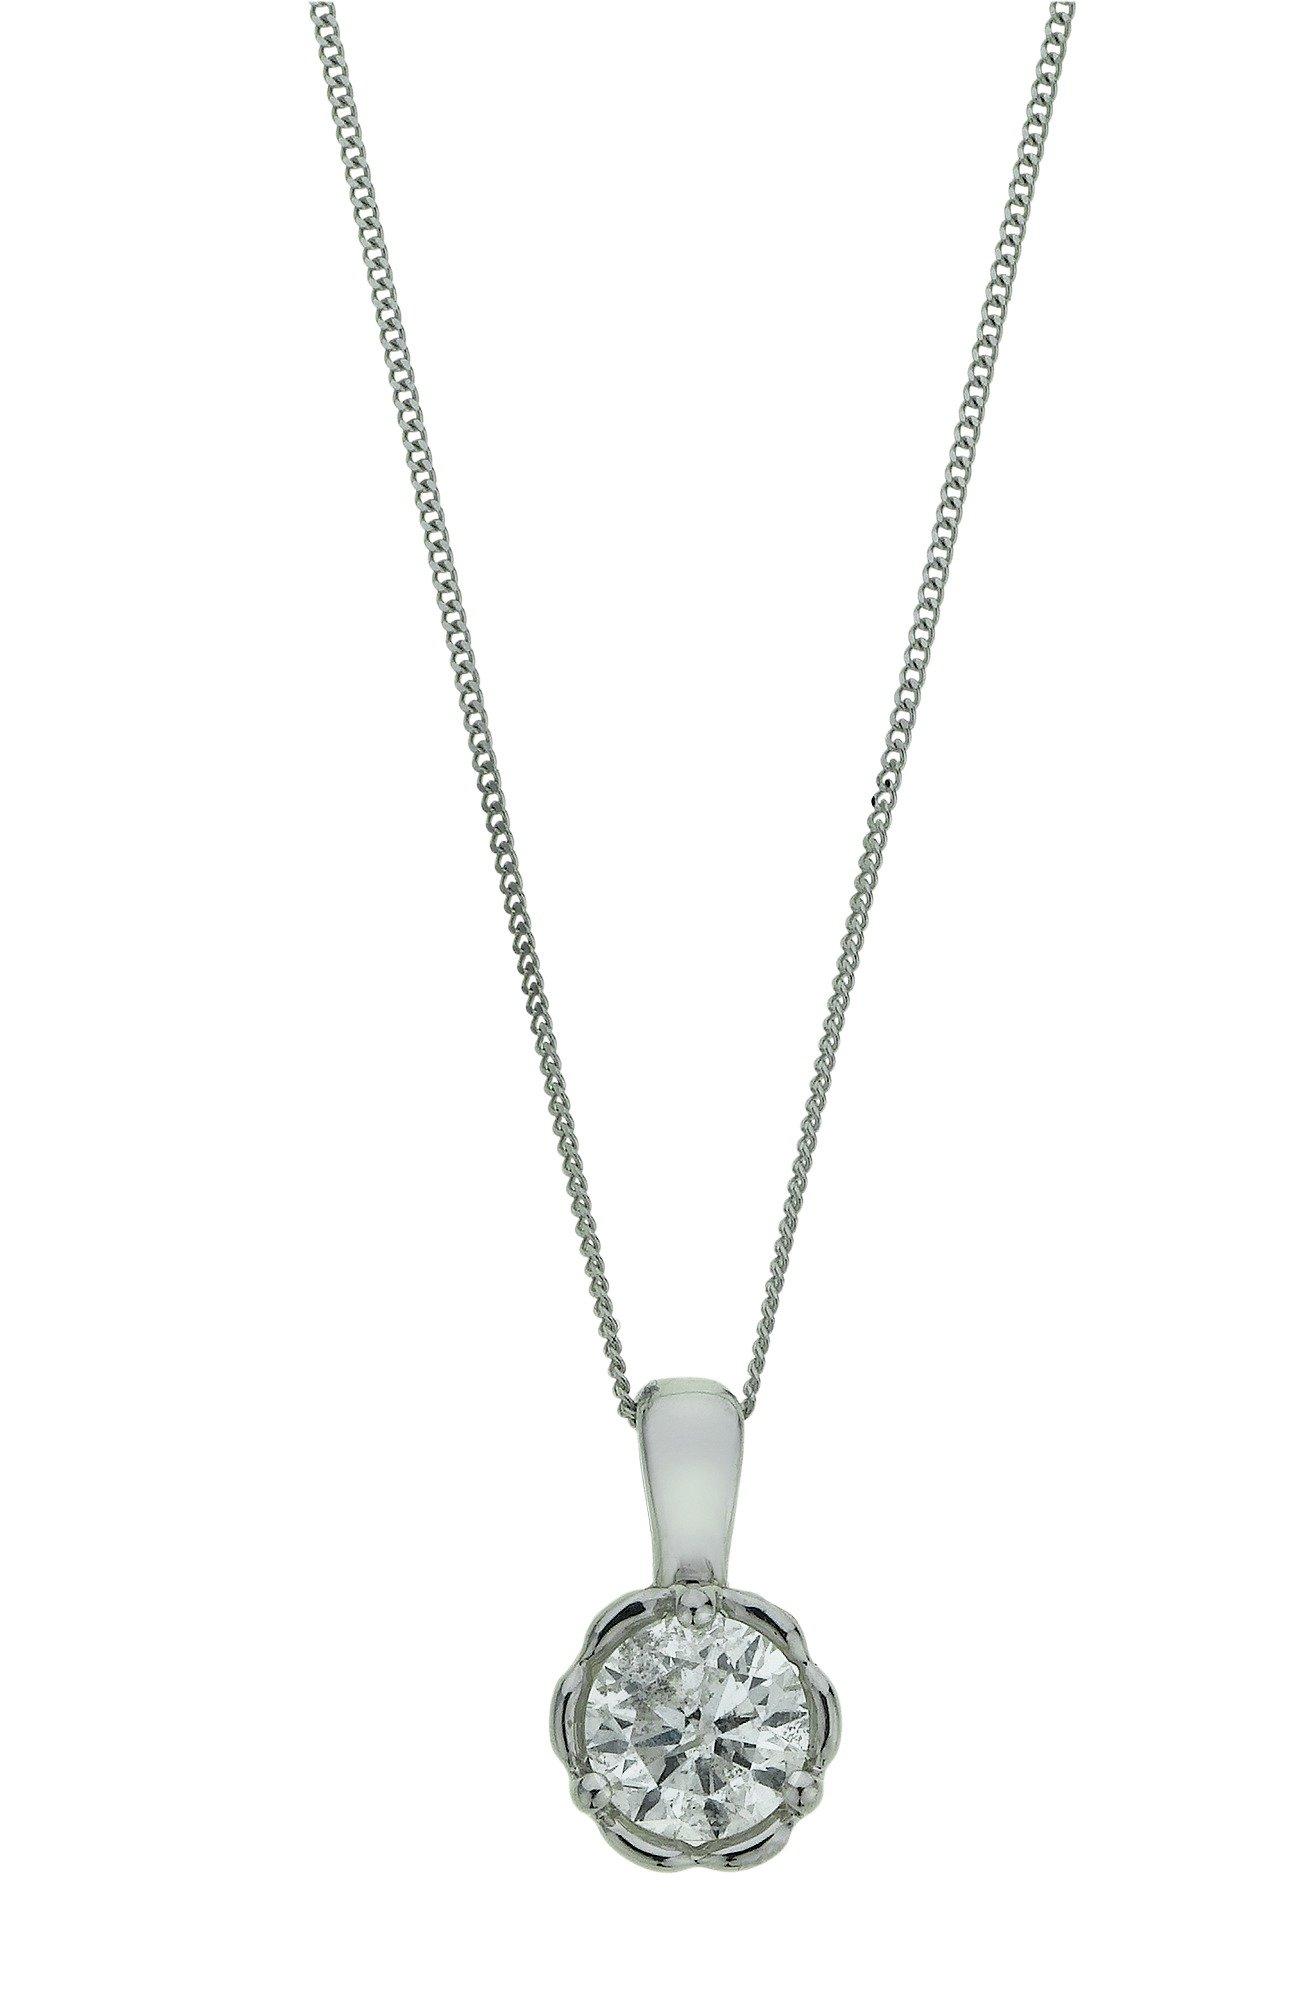 Image of Enchanted - 9 Carat White Gold - 0.50 Carat Diamond Pendant.